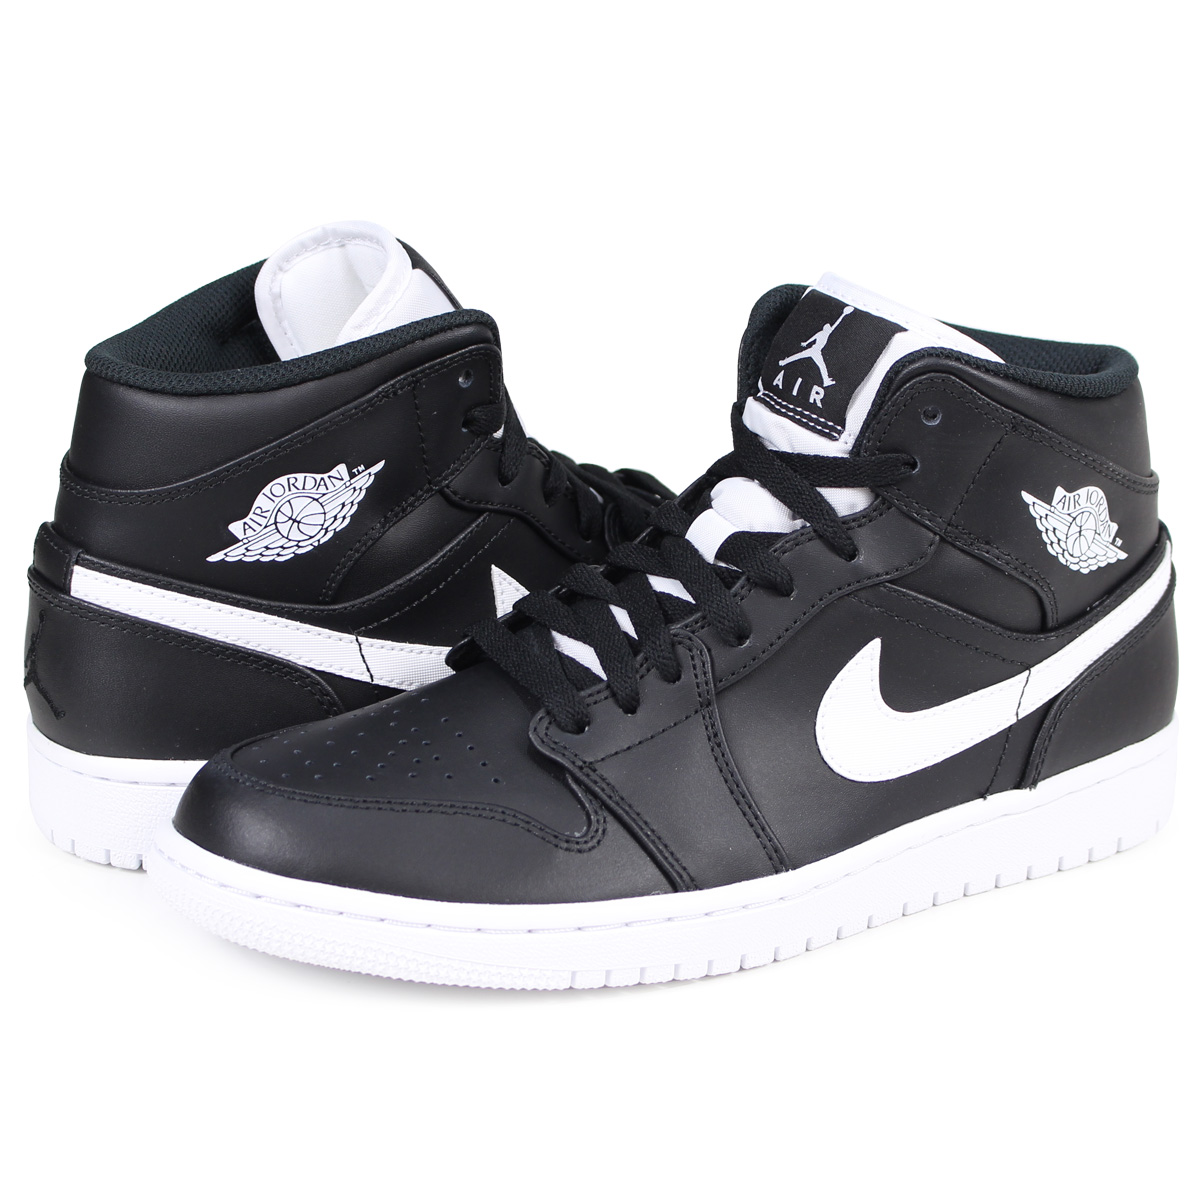 571551832597b5 Whats up Sports  Nike NIKE Air Jordan 1 sneakers AIR JORDAN 1 MID ...